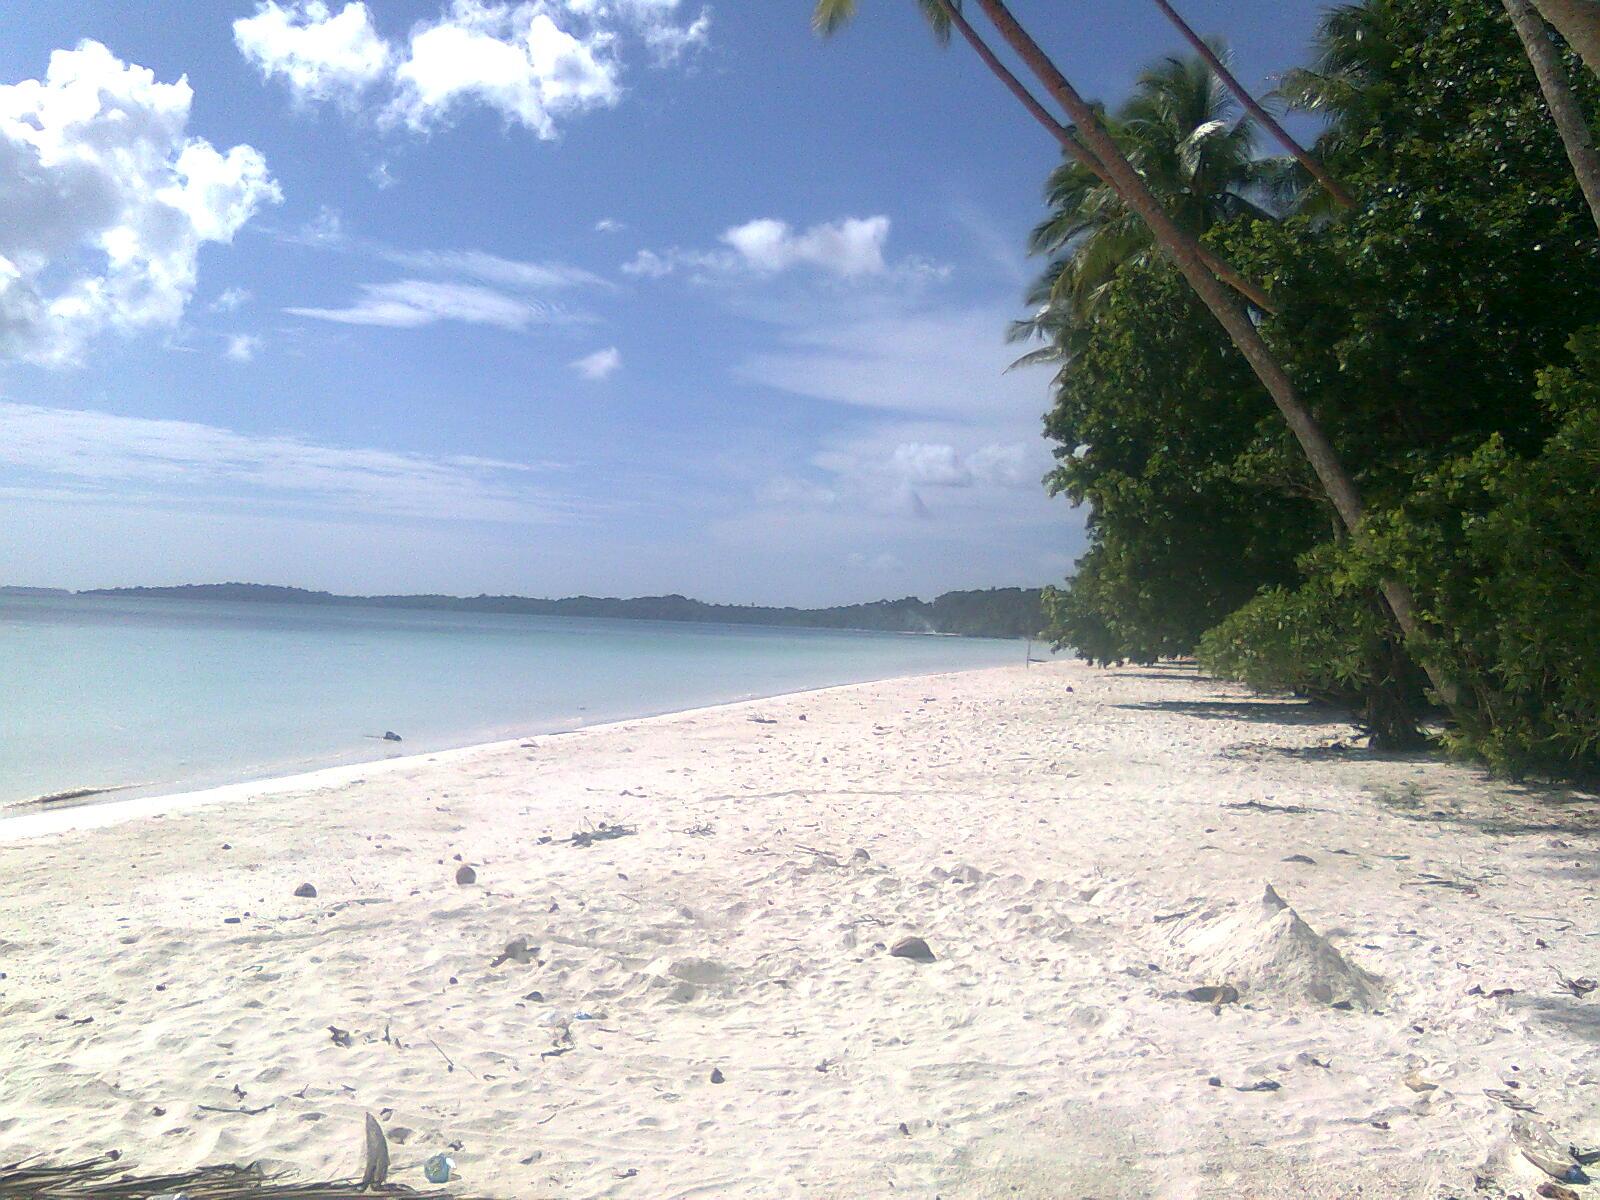 Alfin Hiber Zone Pantai Pasir Panjang Ngurbloat Tual Maluku Tenggara